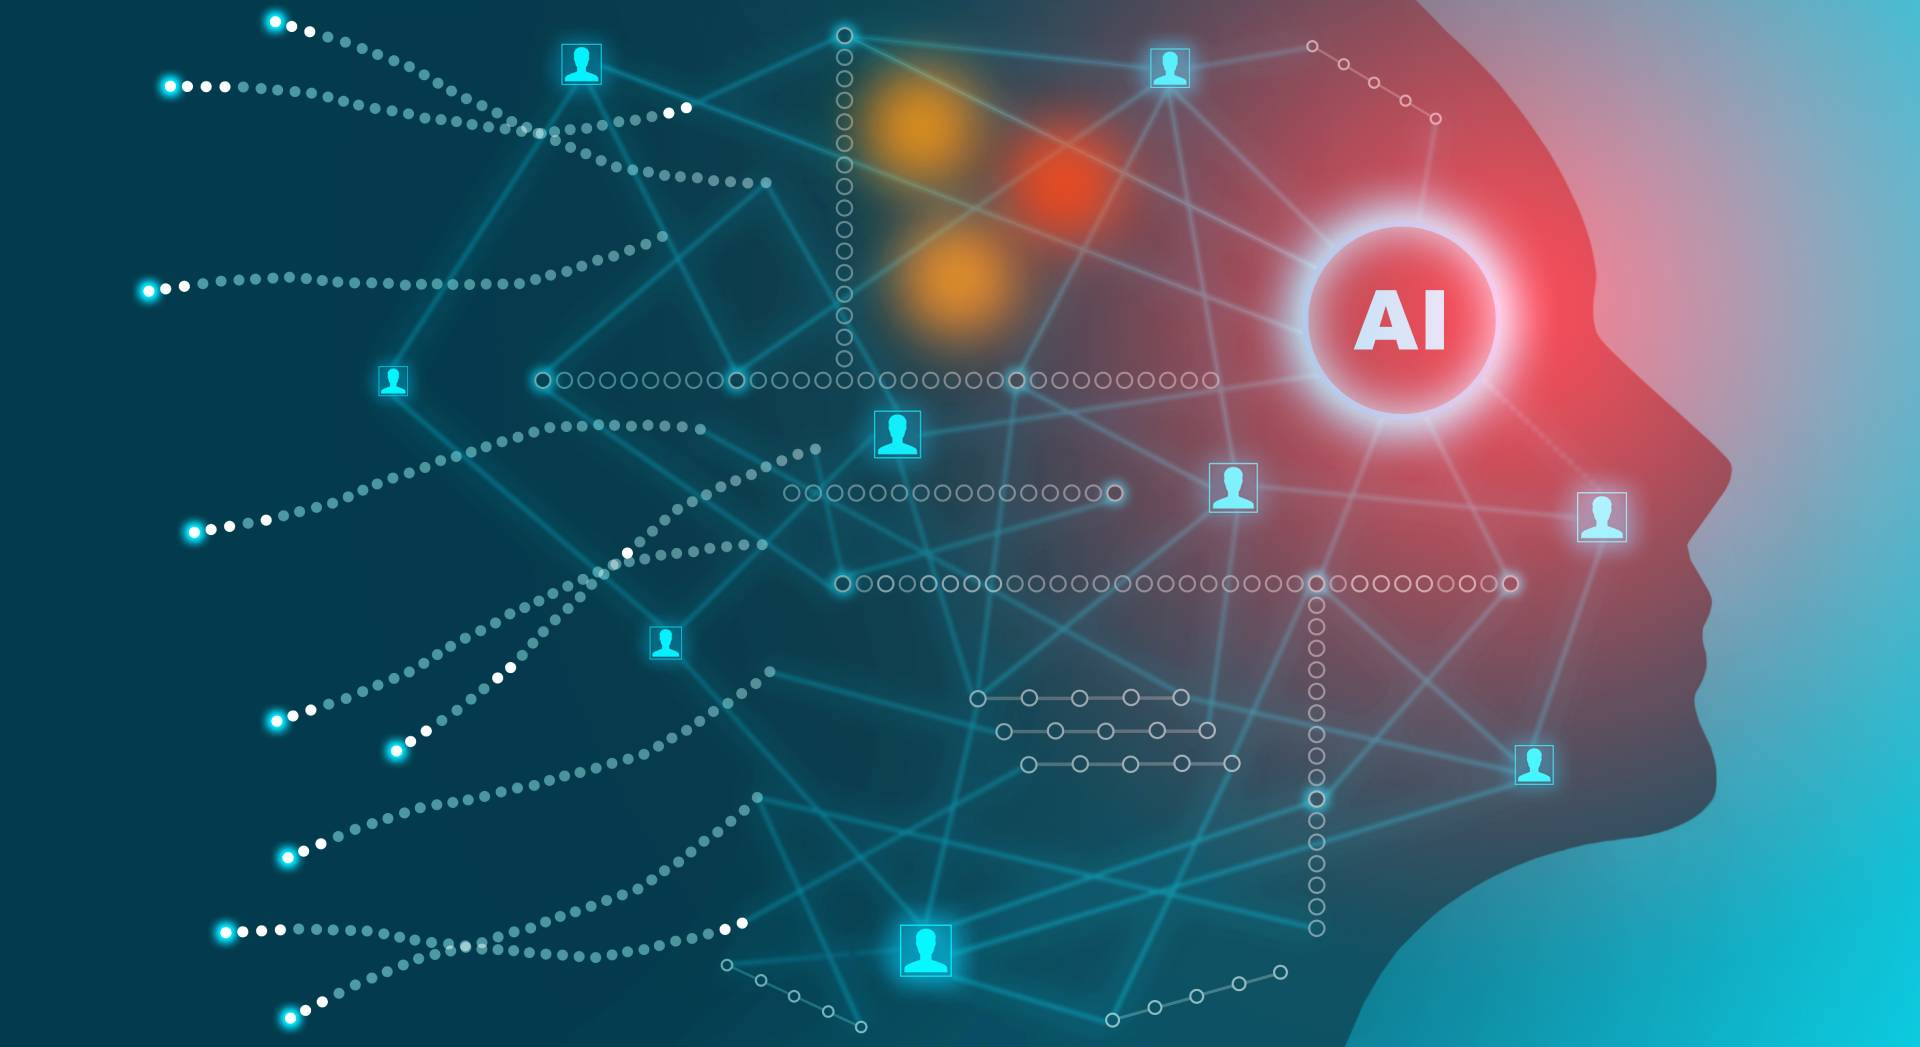 AI and big data head icon